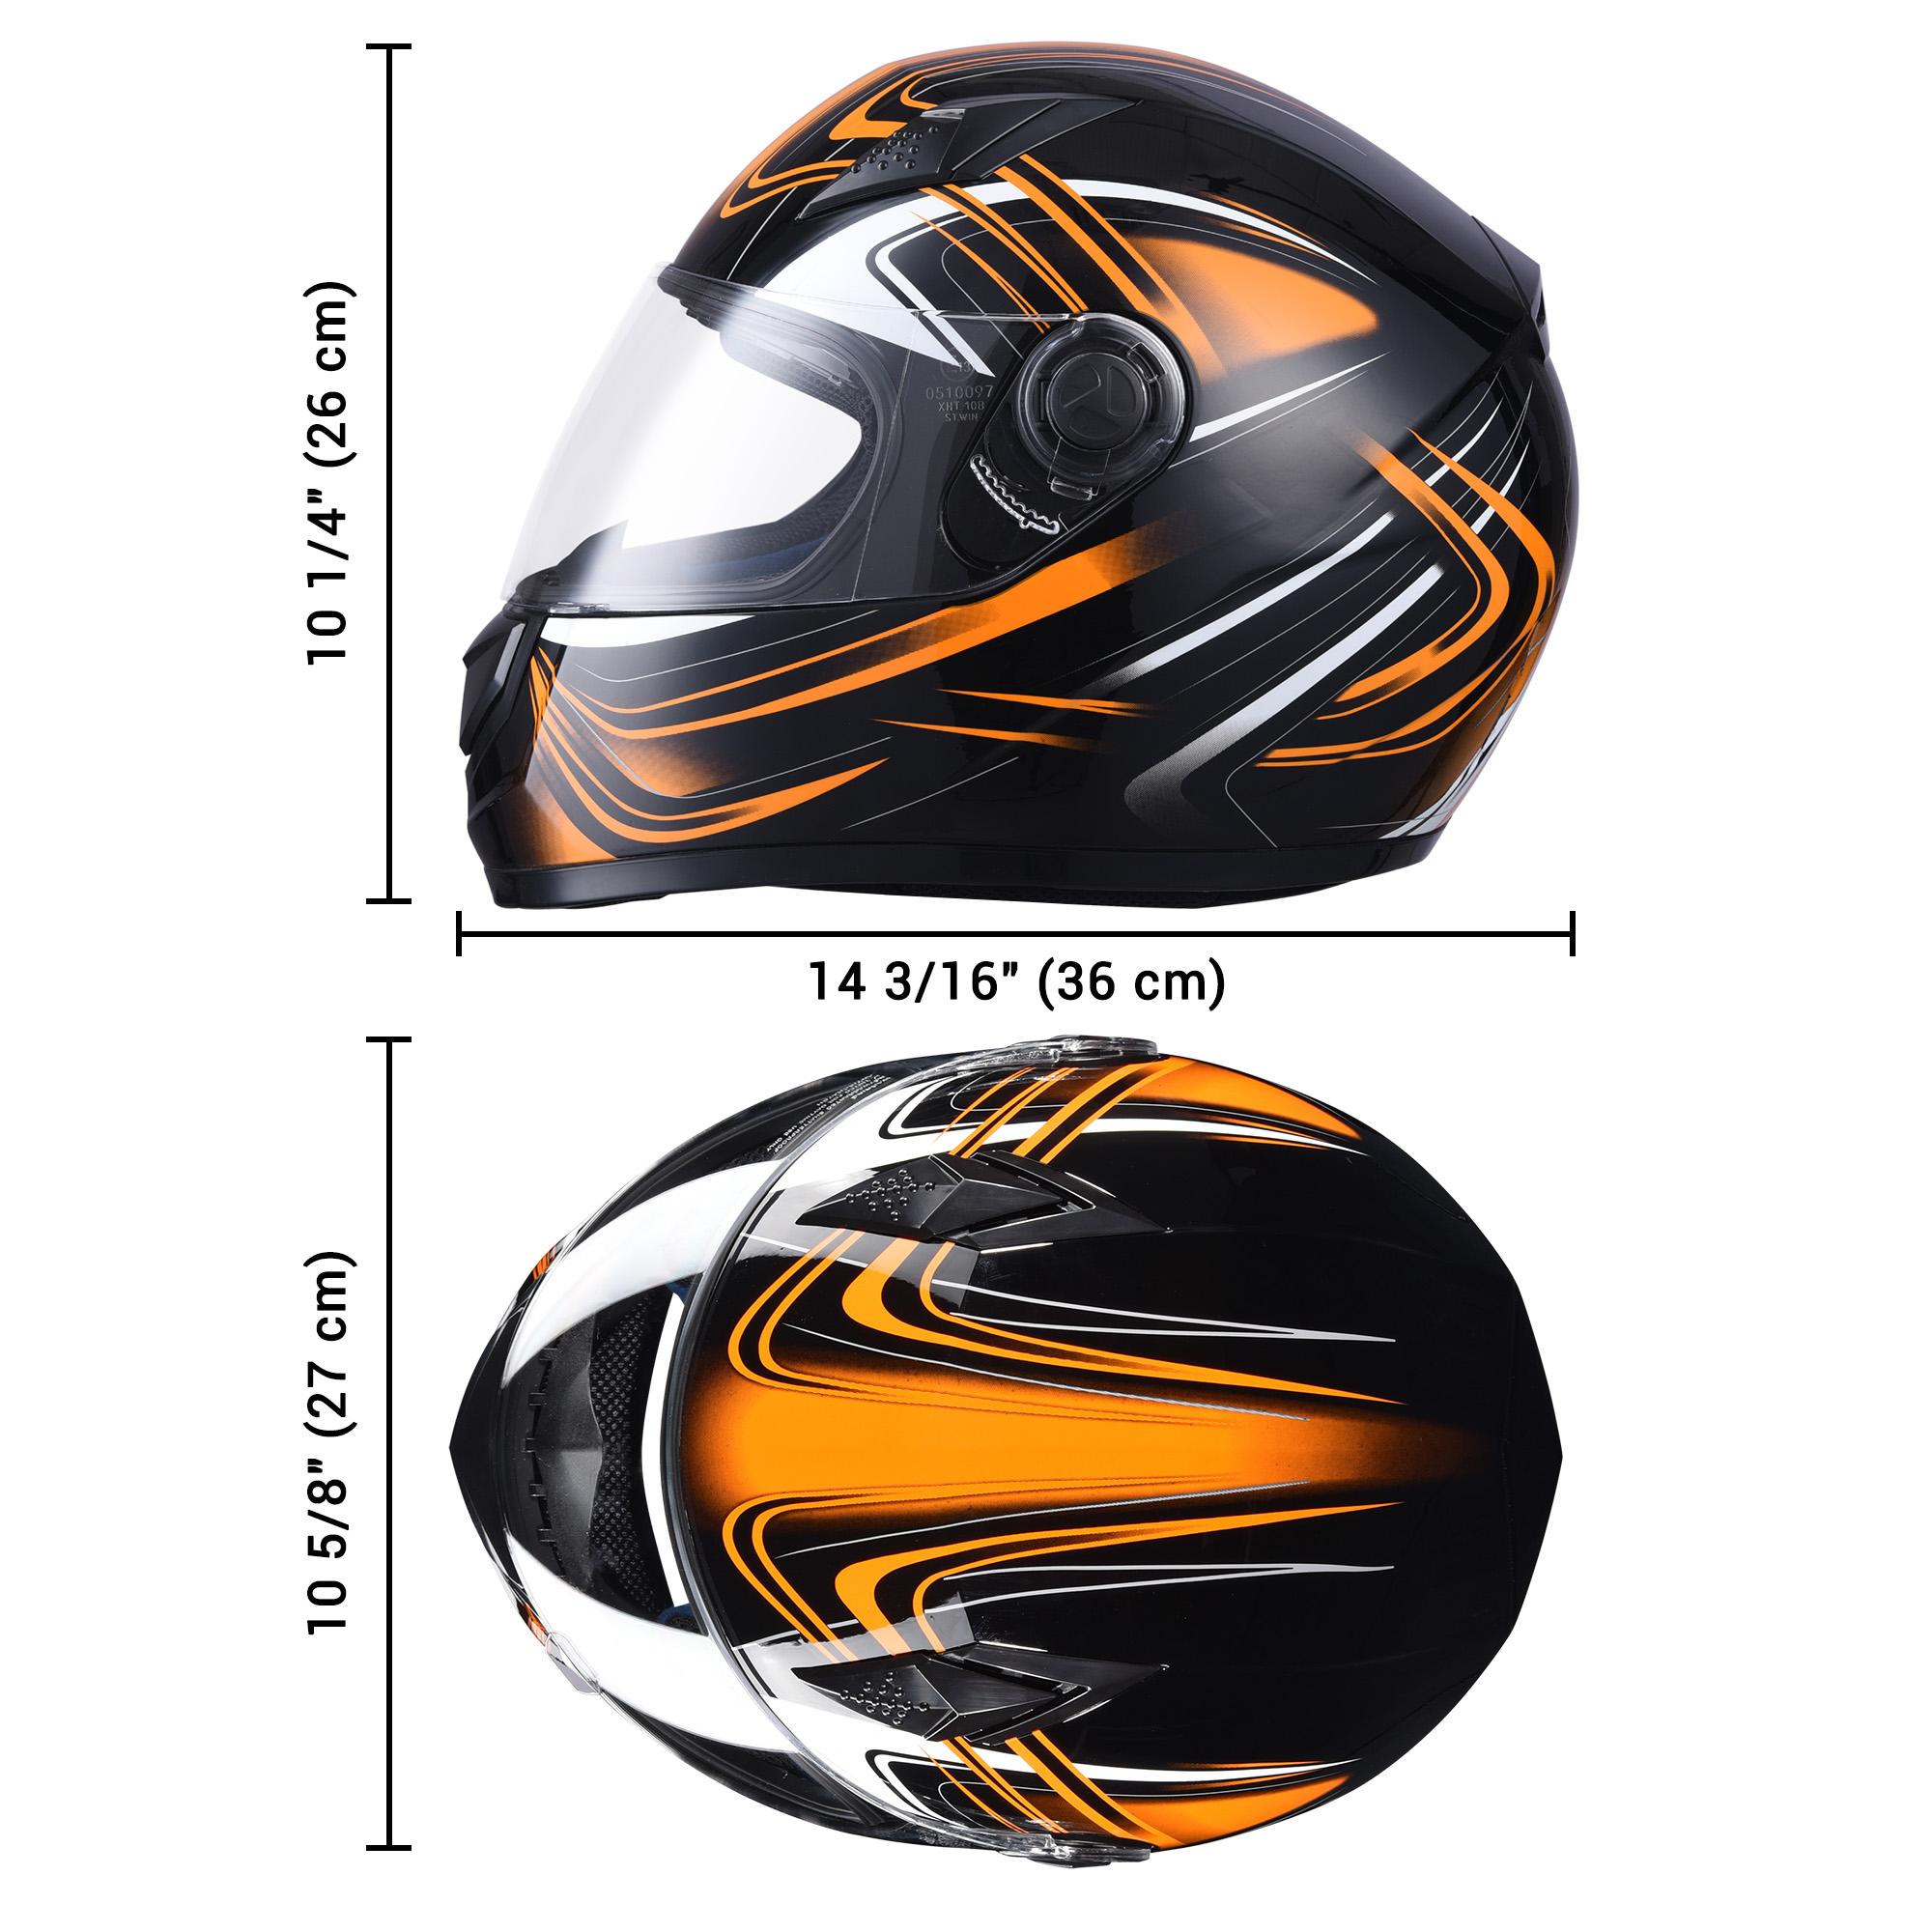 miniature 153 - AHR K12 Full Face Motorcycle Helmet DOT Air Vents Clear Visor Racing S M L XL